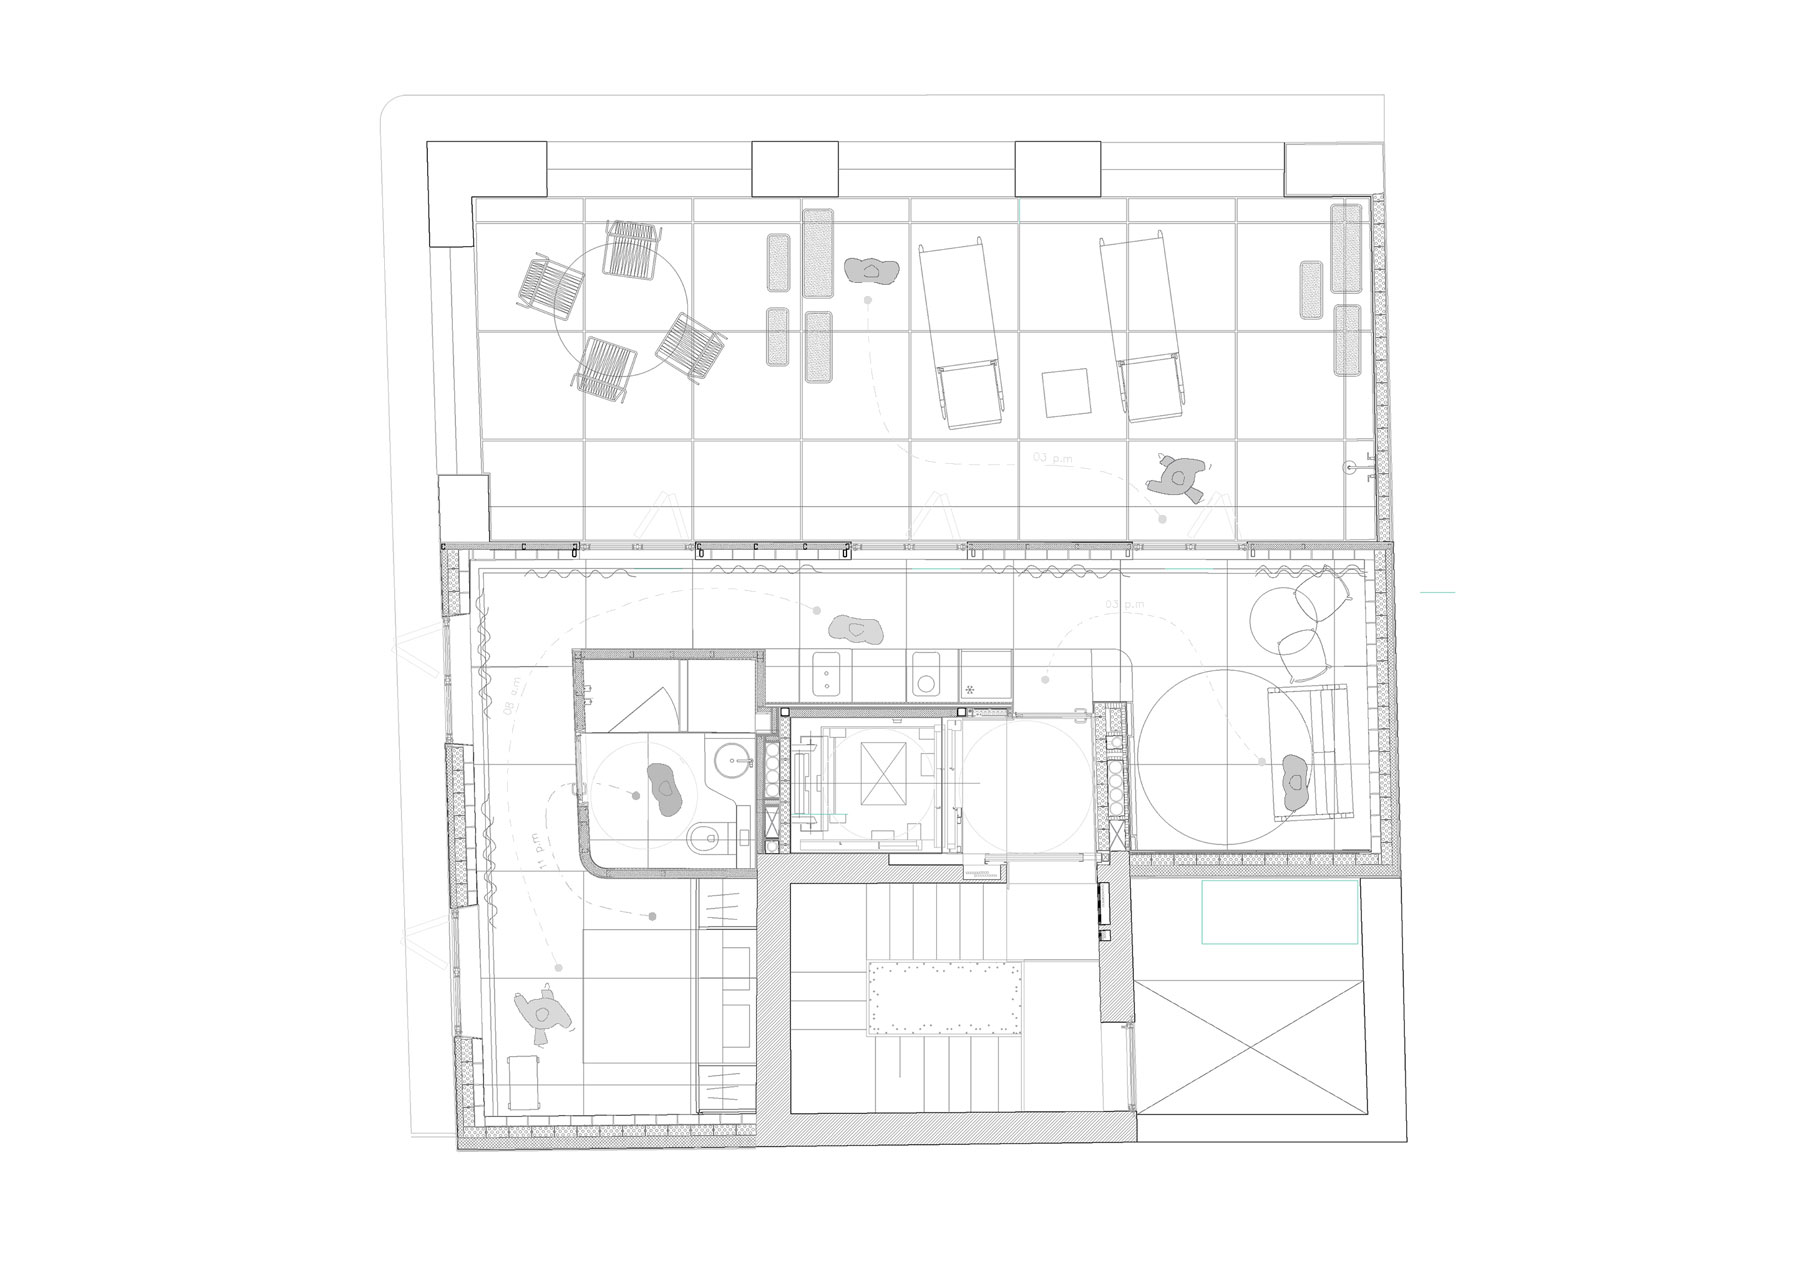 rehabilitacion-edificio-alicante-plano